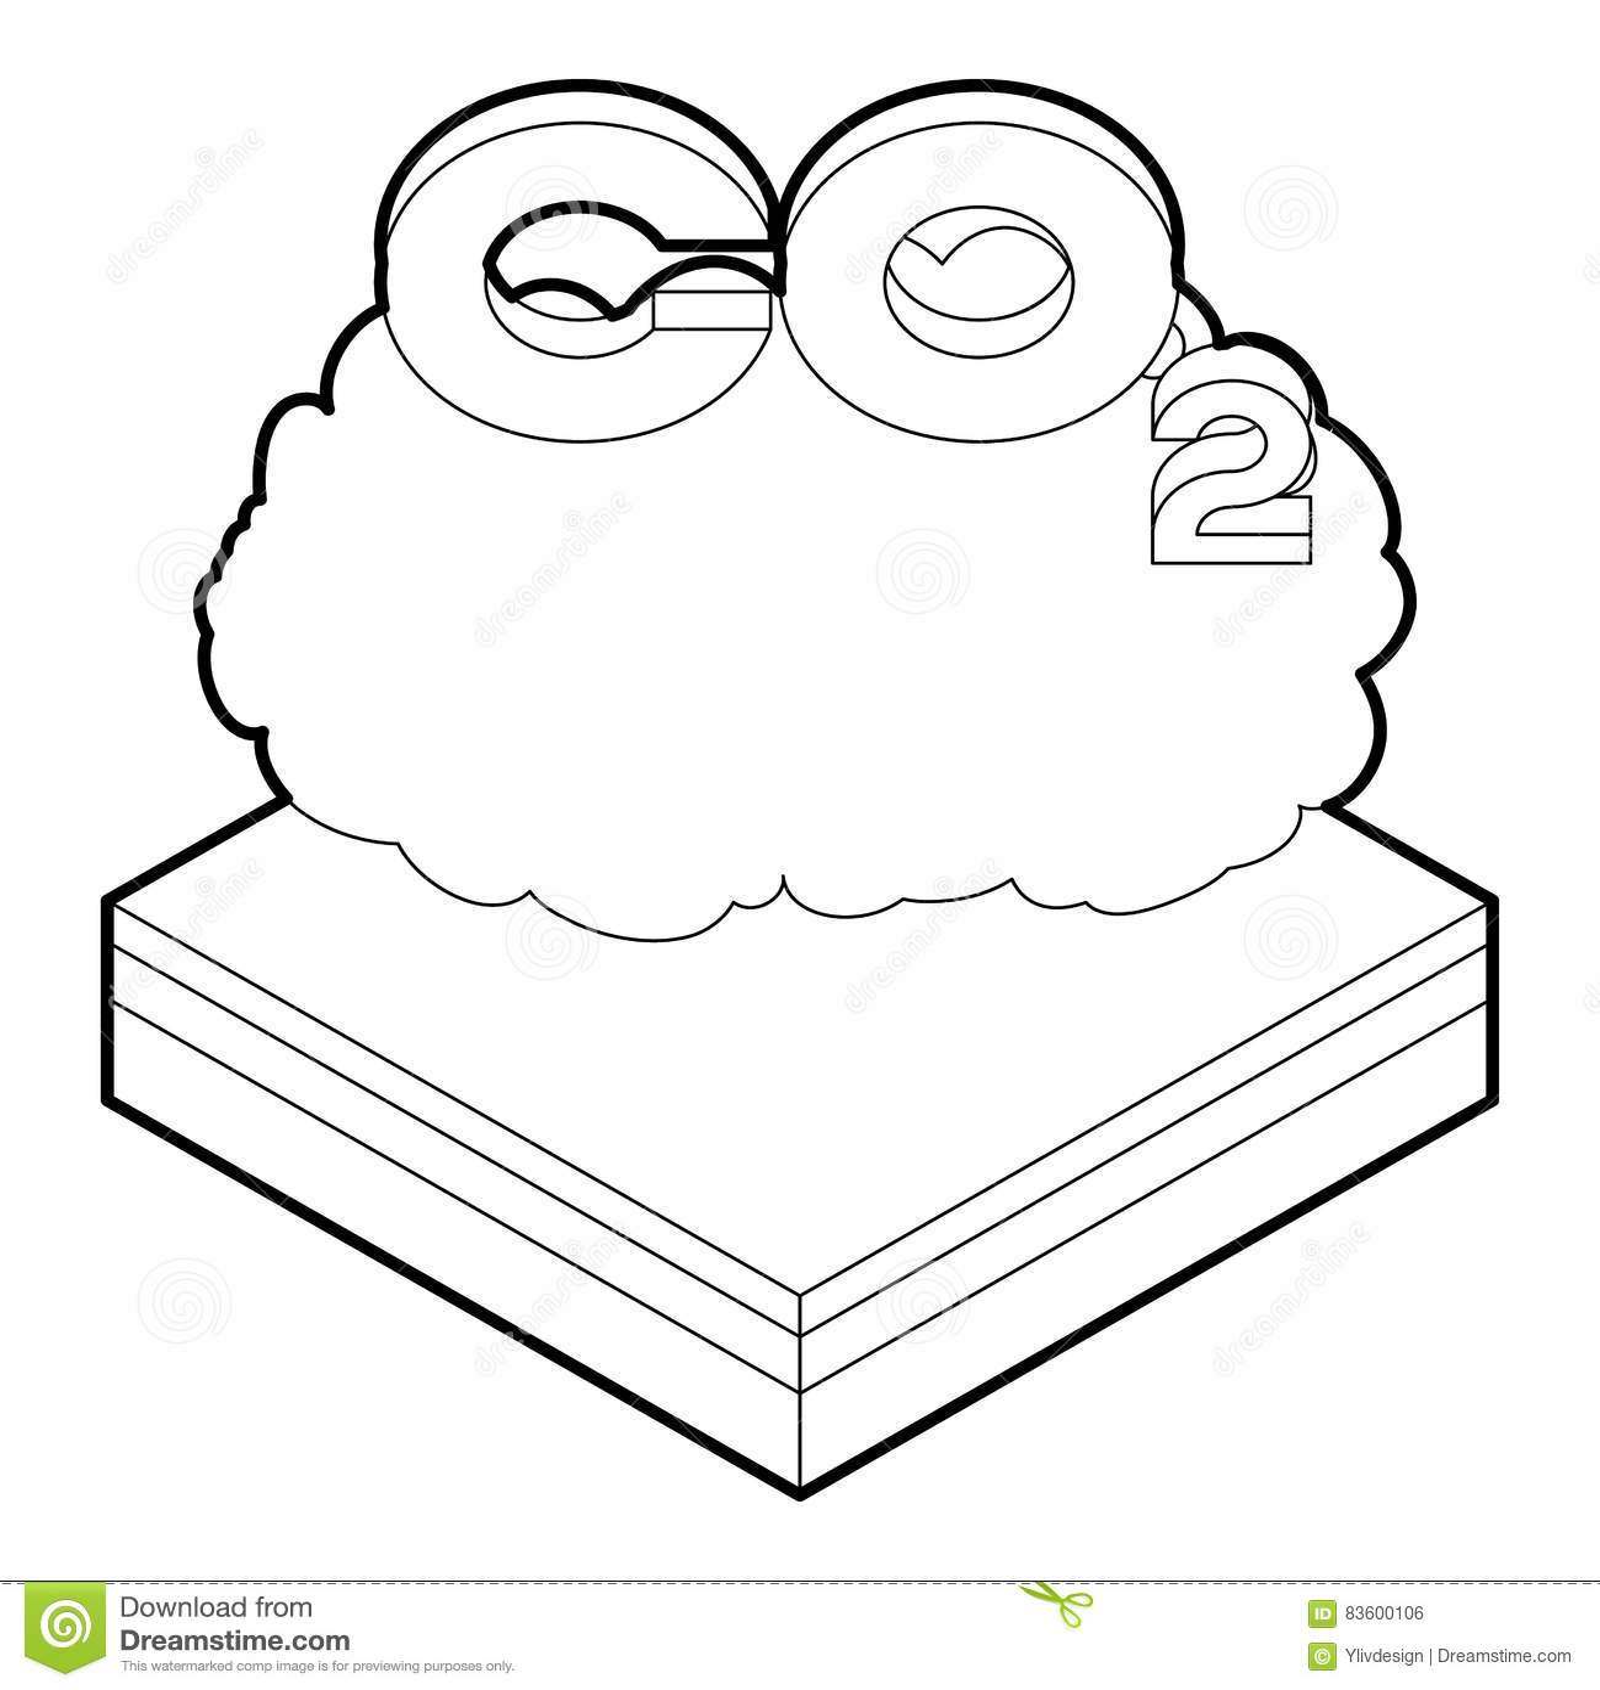 co2 emission line icon  vector illustration